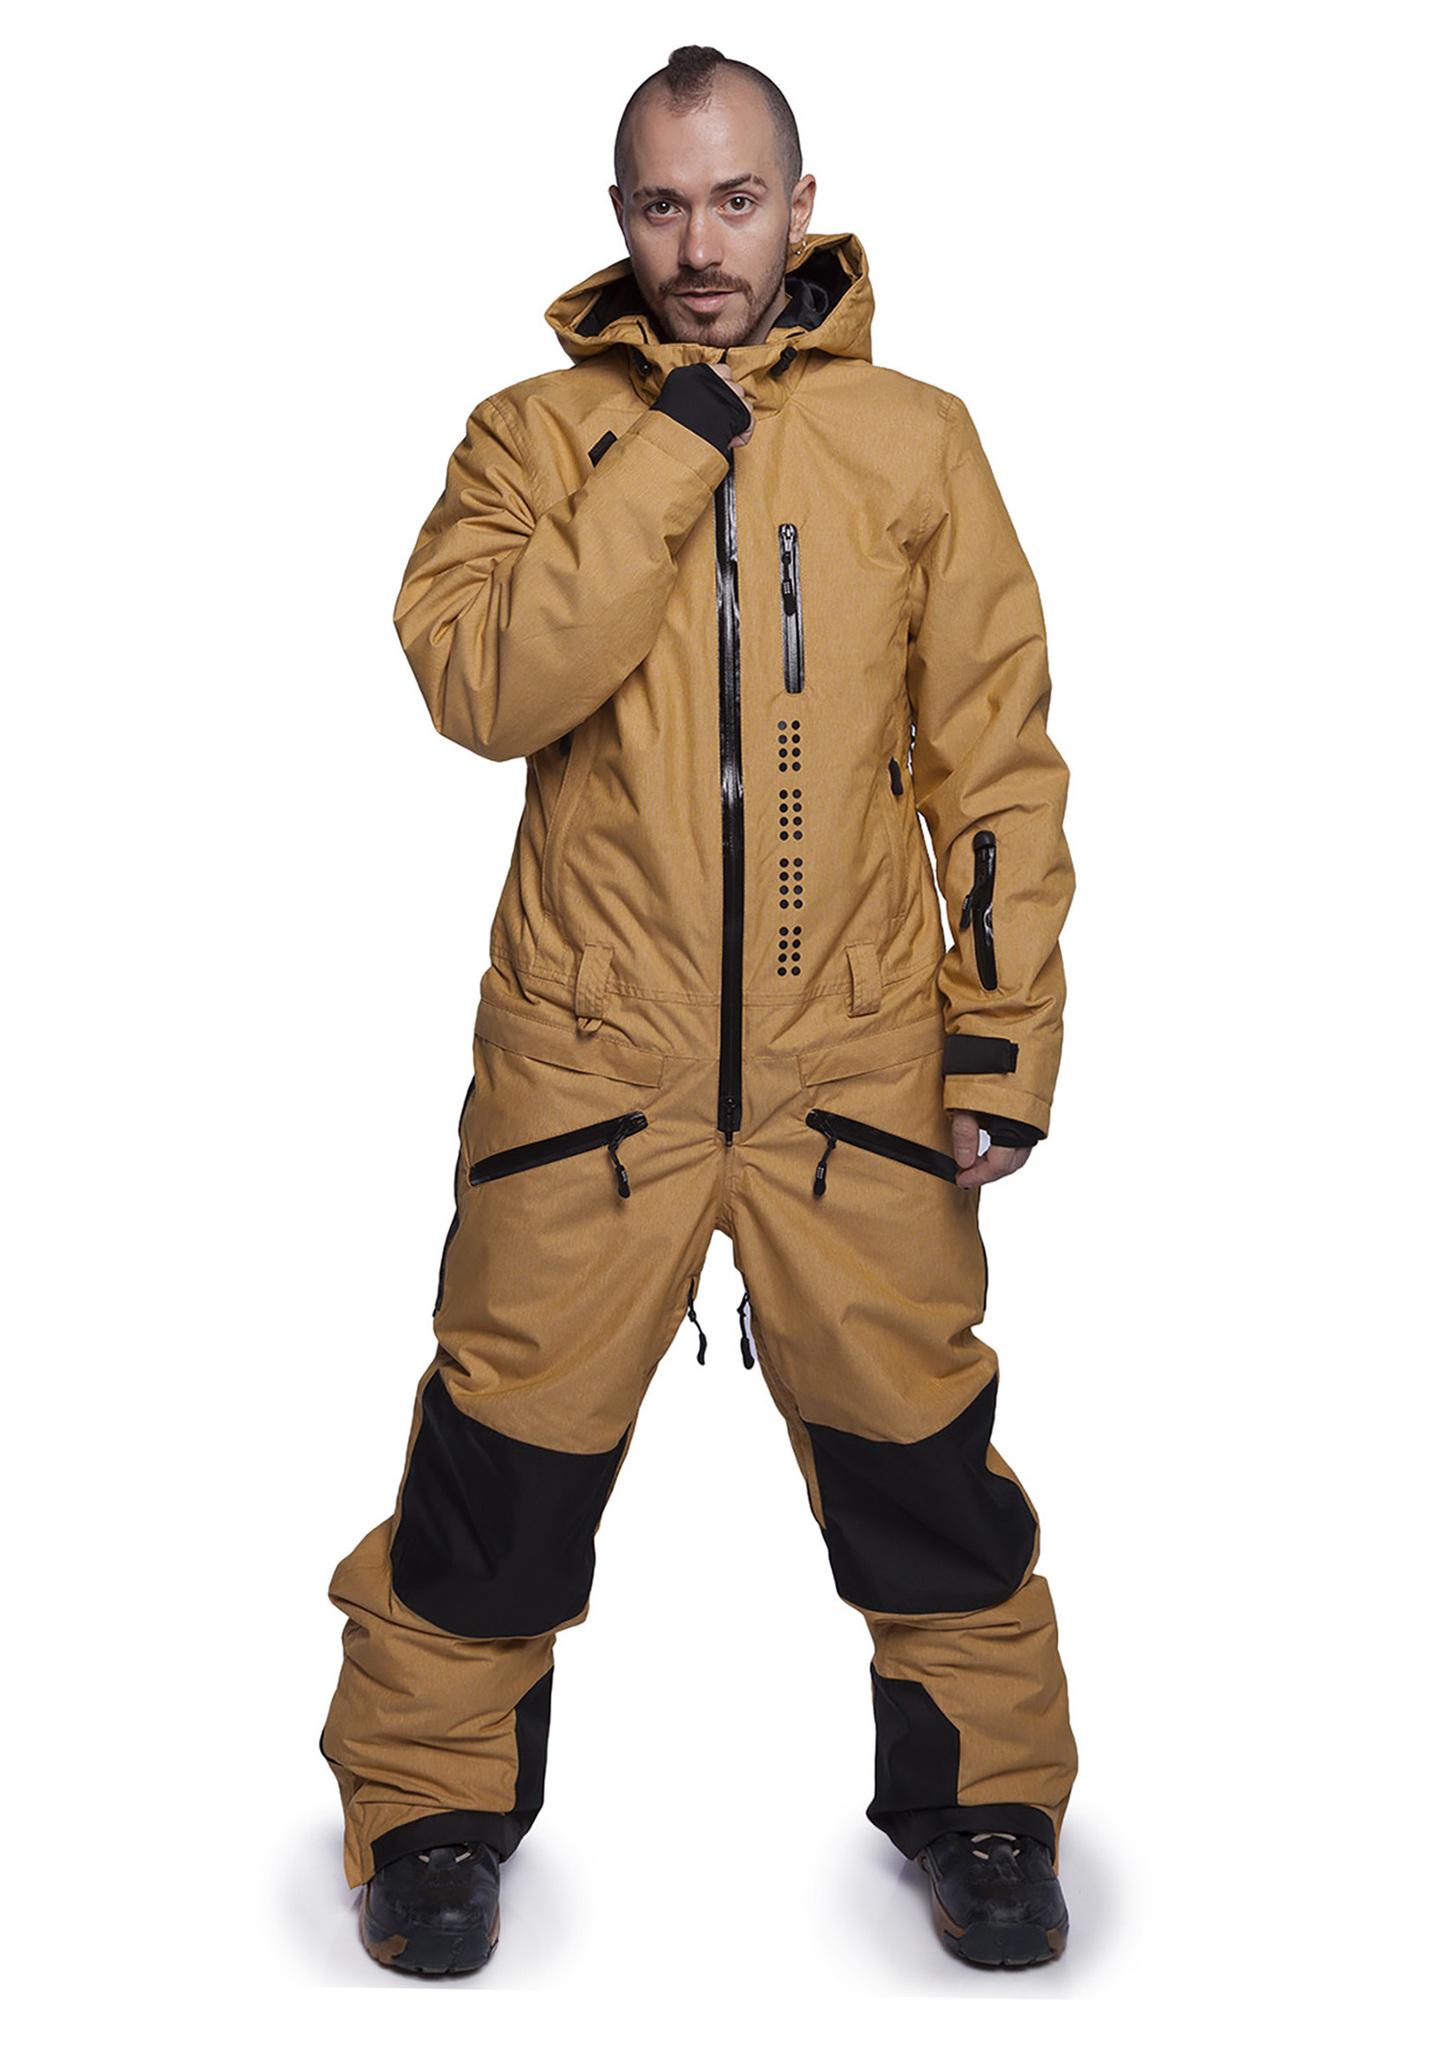 Мужской сноубордический комбинезон Cool Zone Kite 31К10М желтый | Интернет-магазин Five-sport.ru